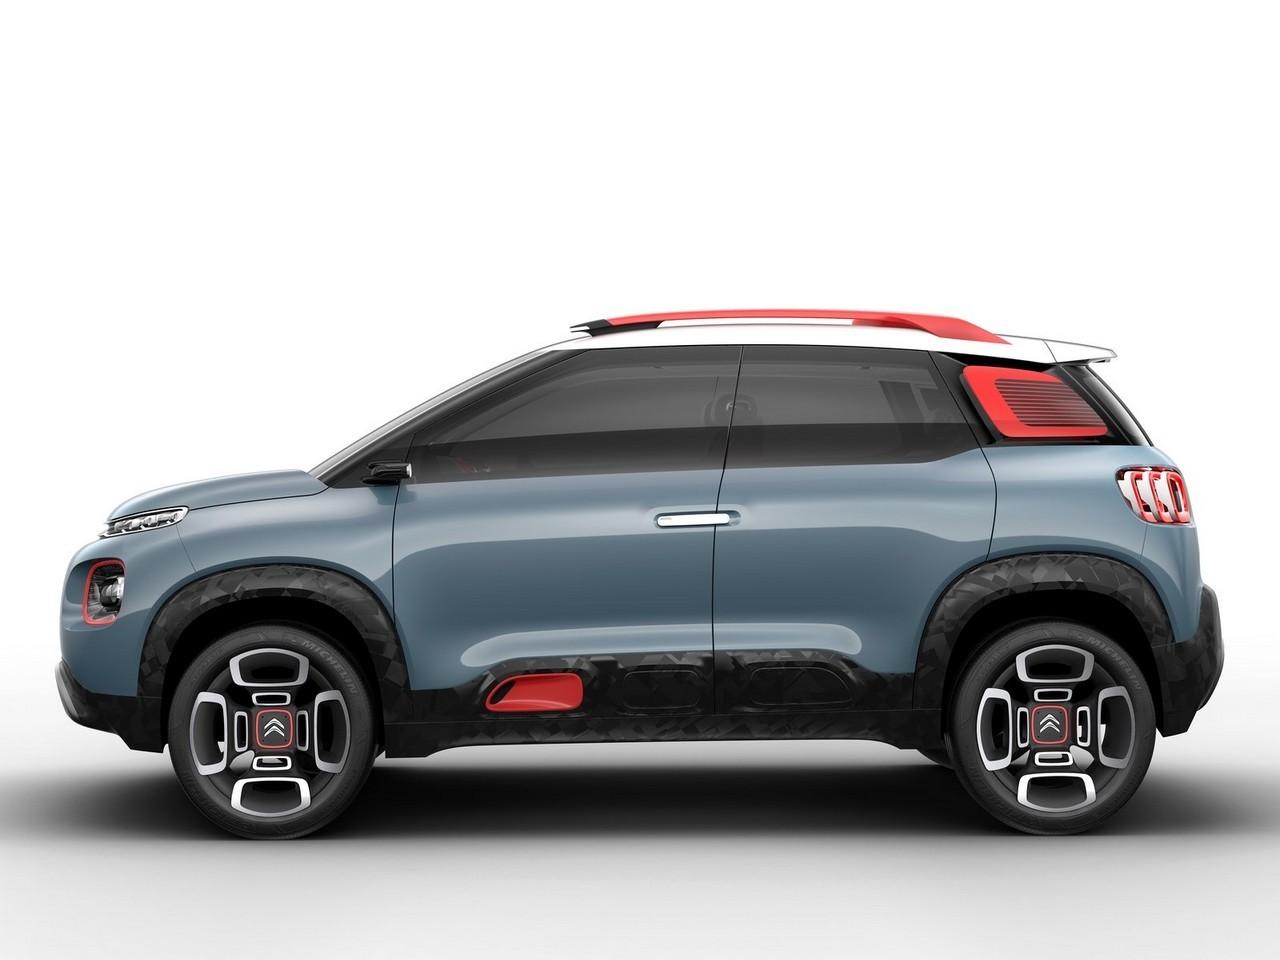 2017 Citroen C-Aircross Concept